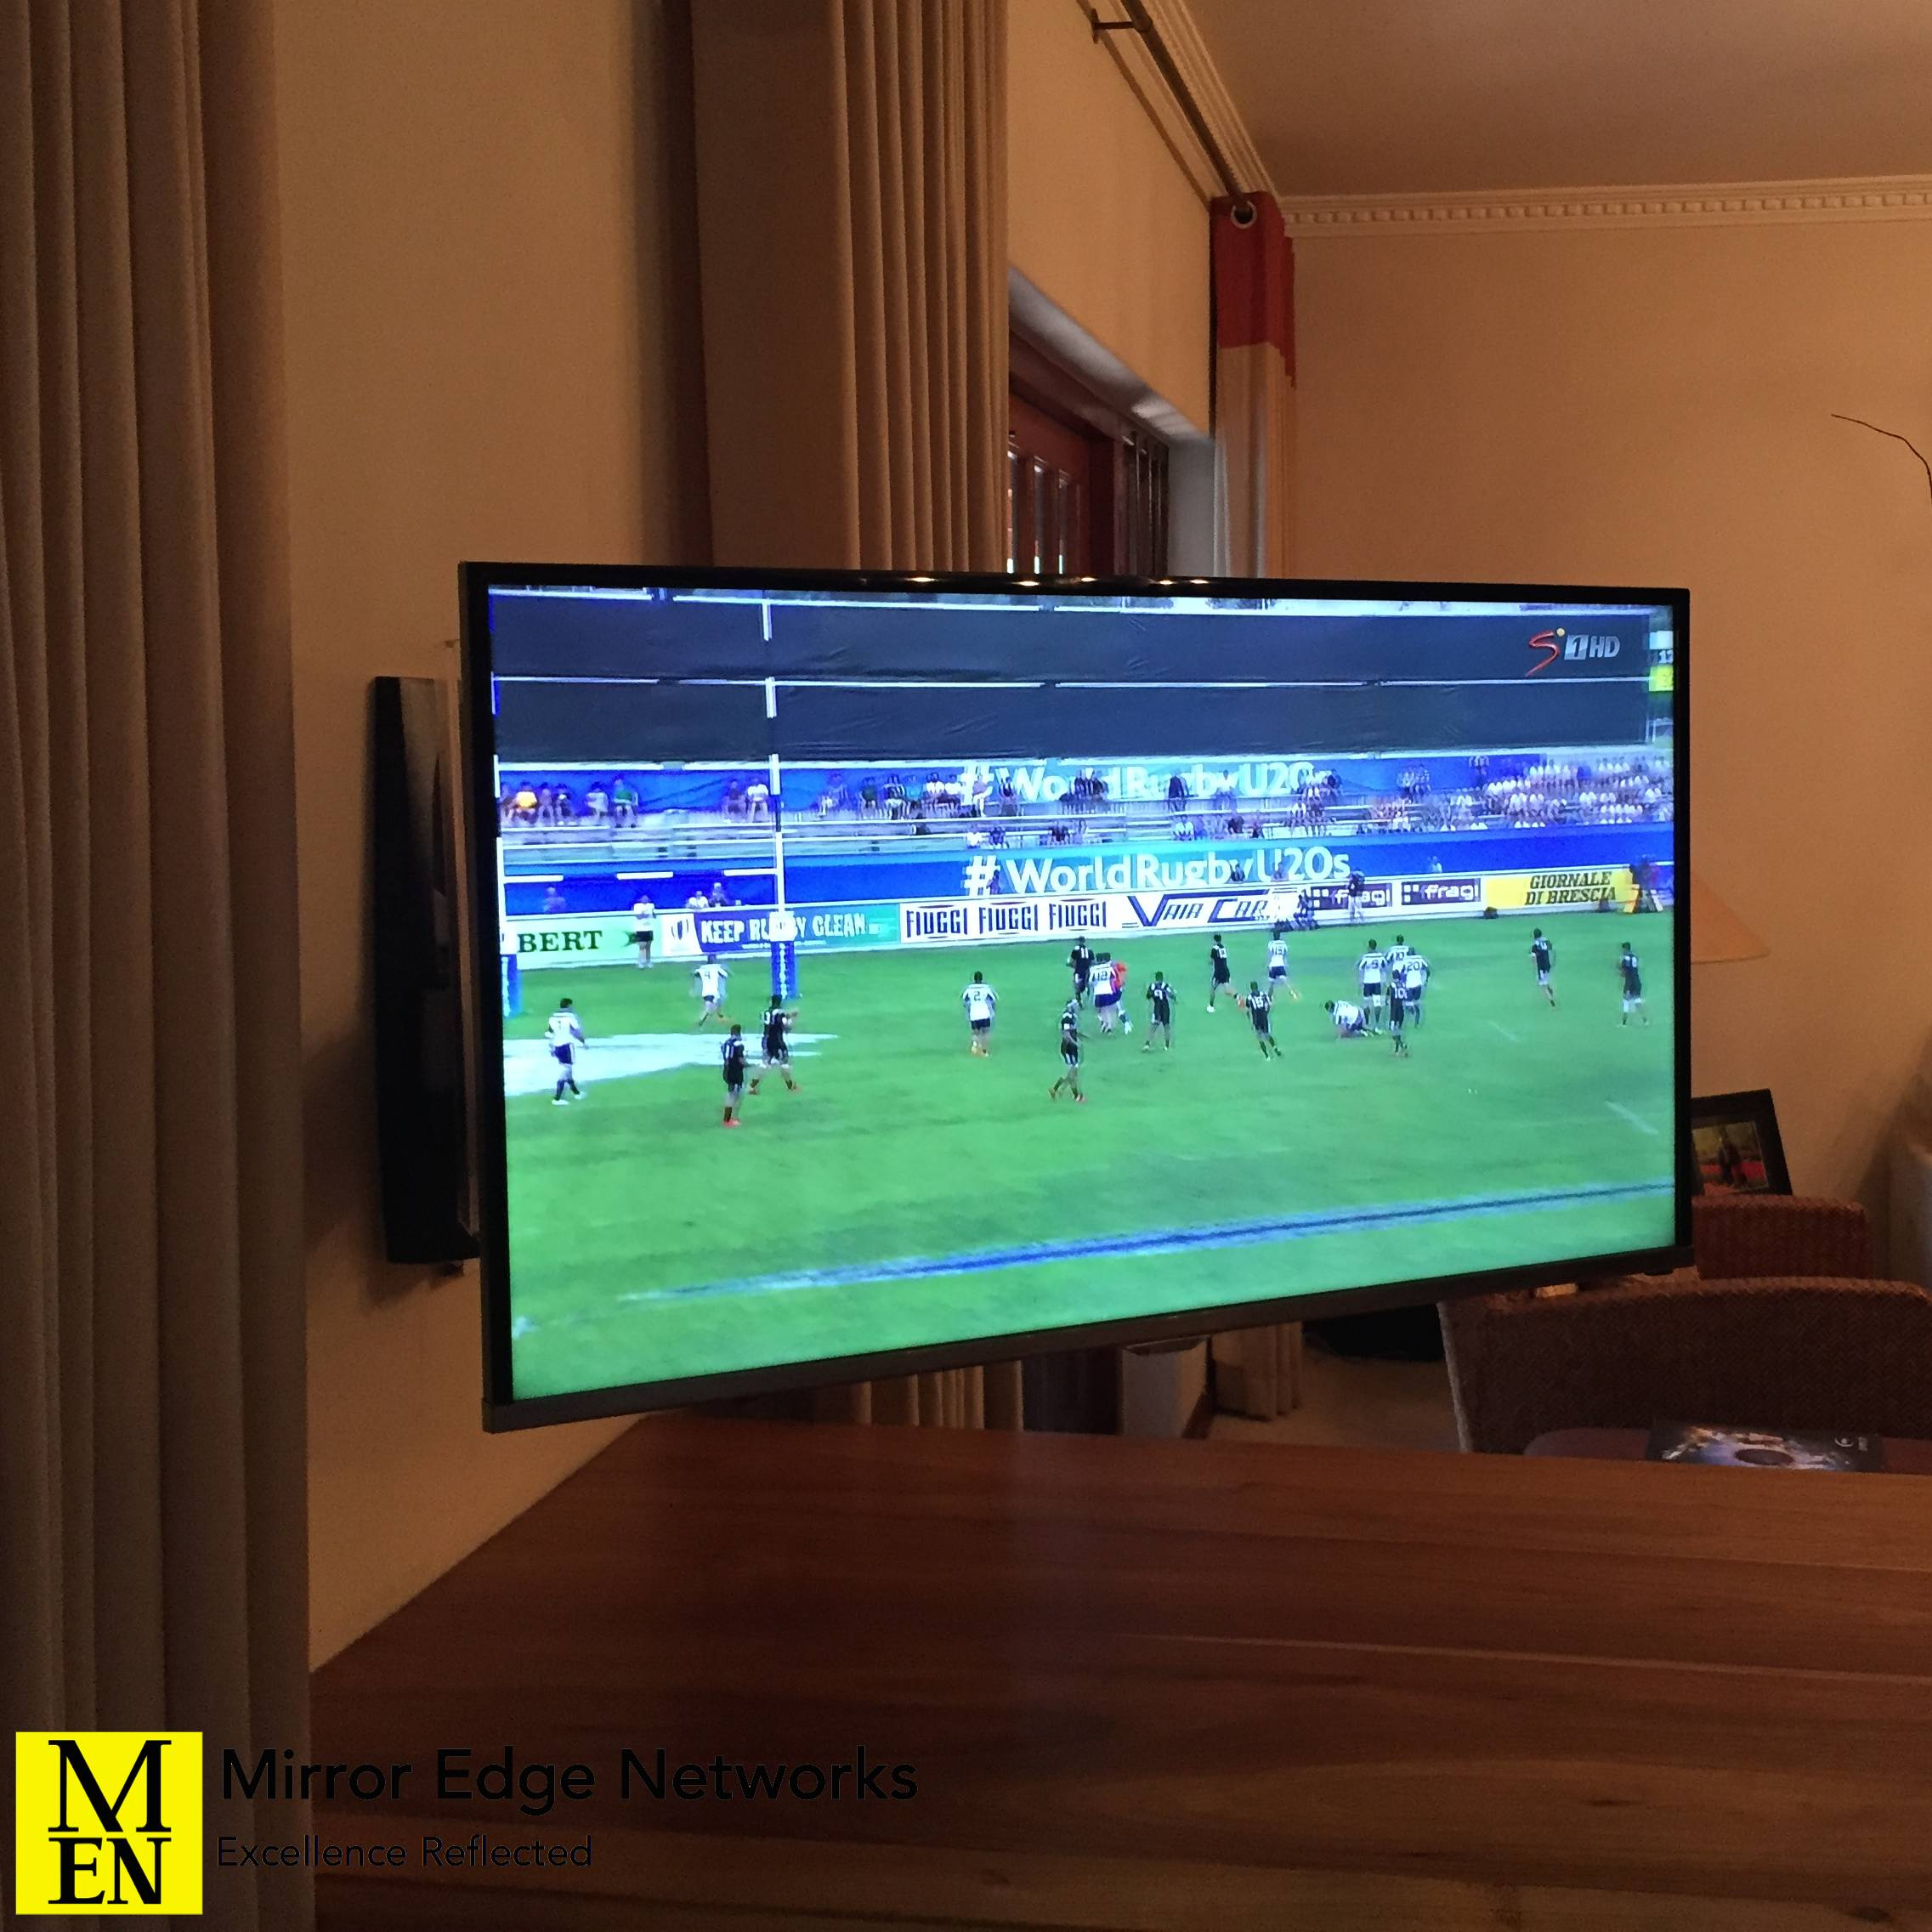 Kitchen Television Constantia Television Installation 18 June 2015